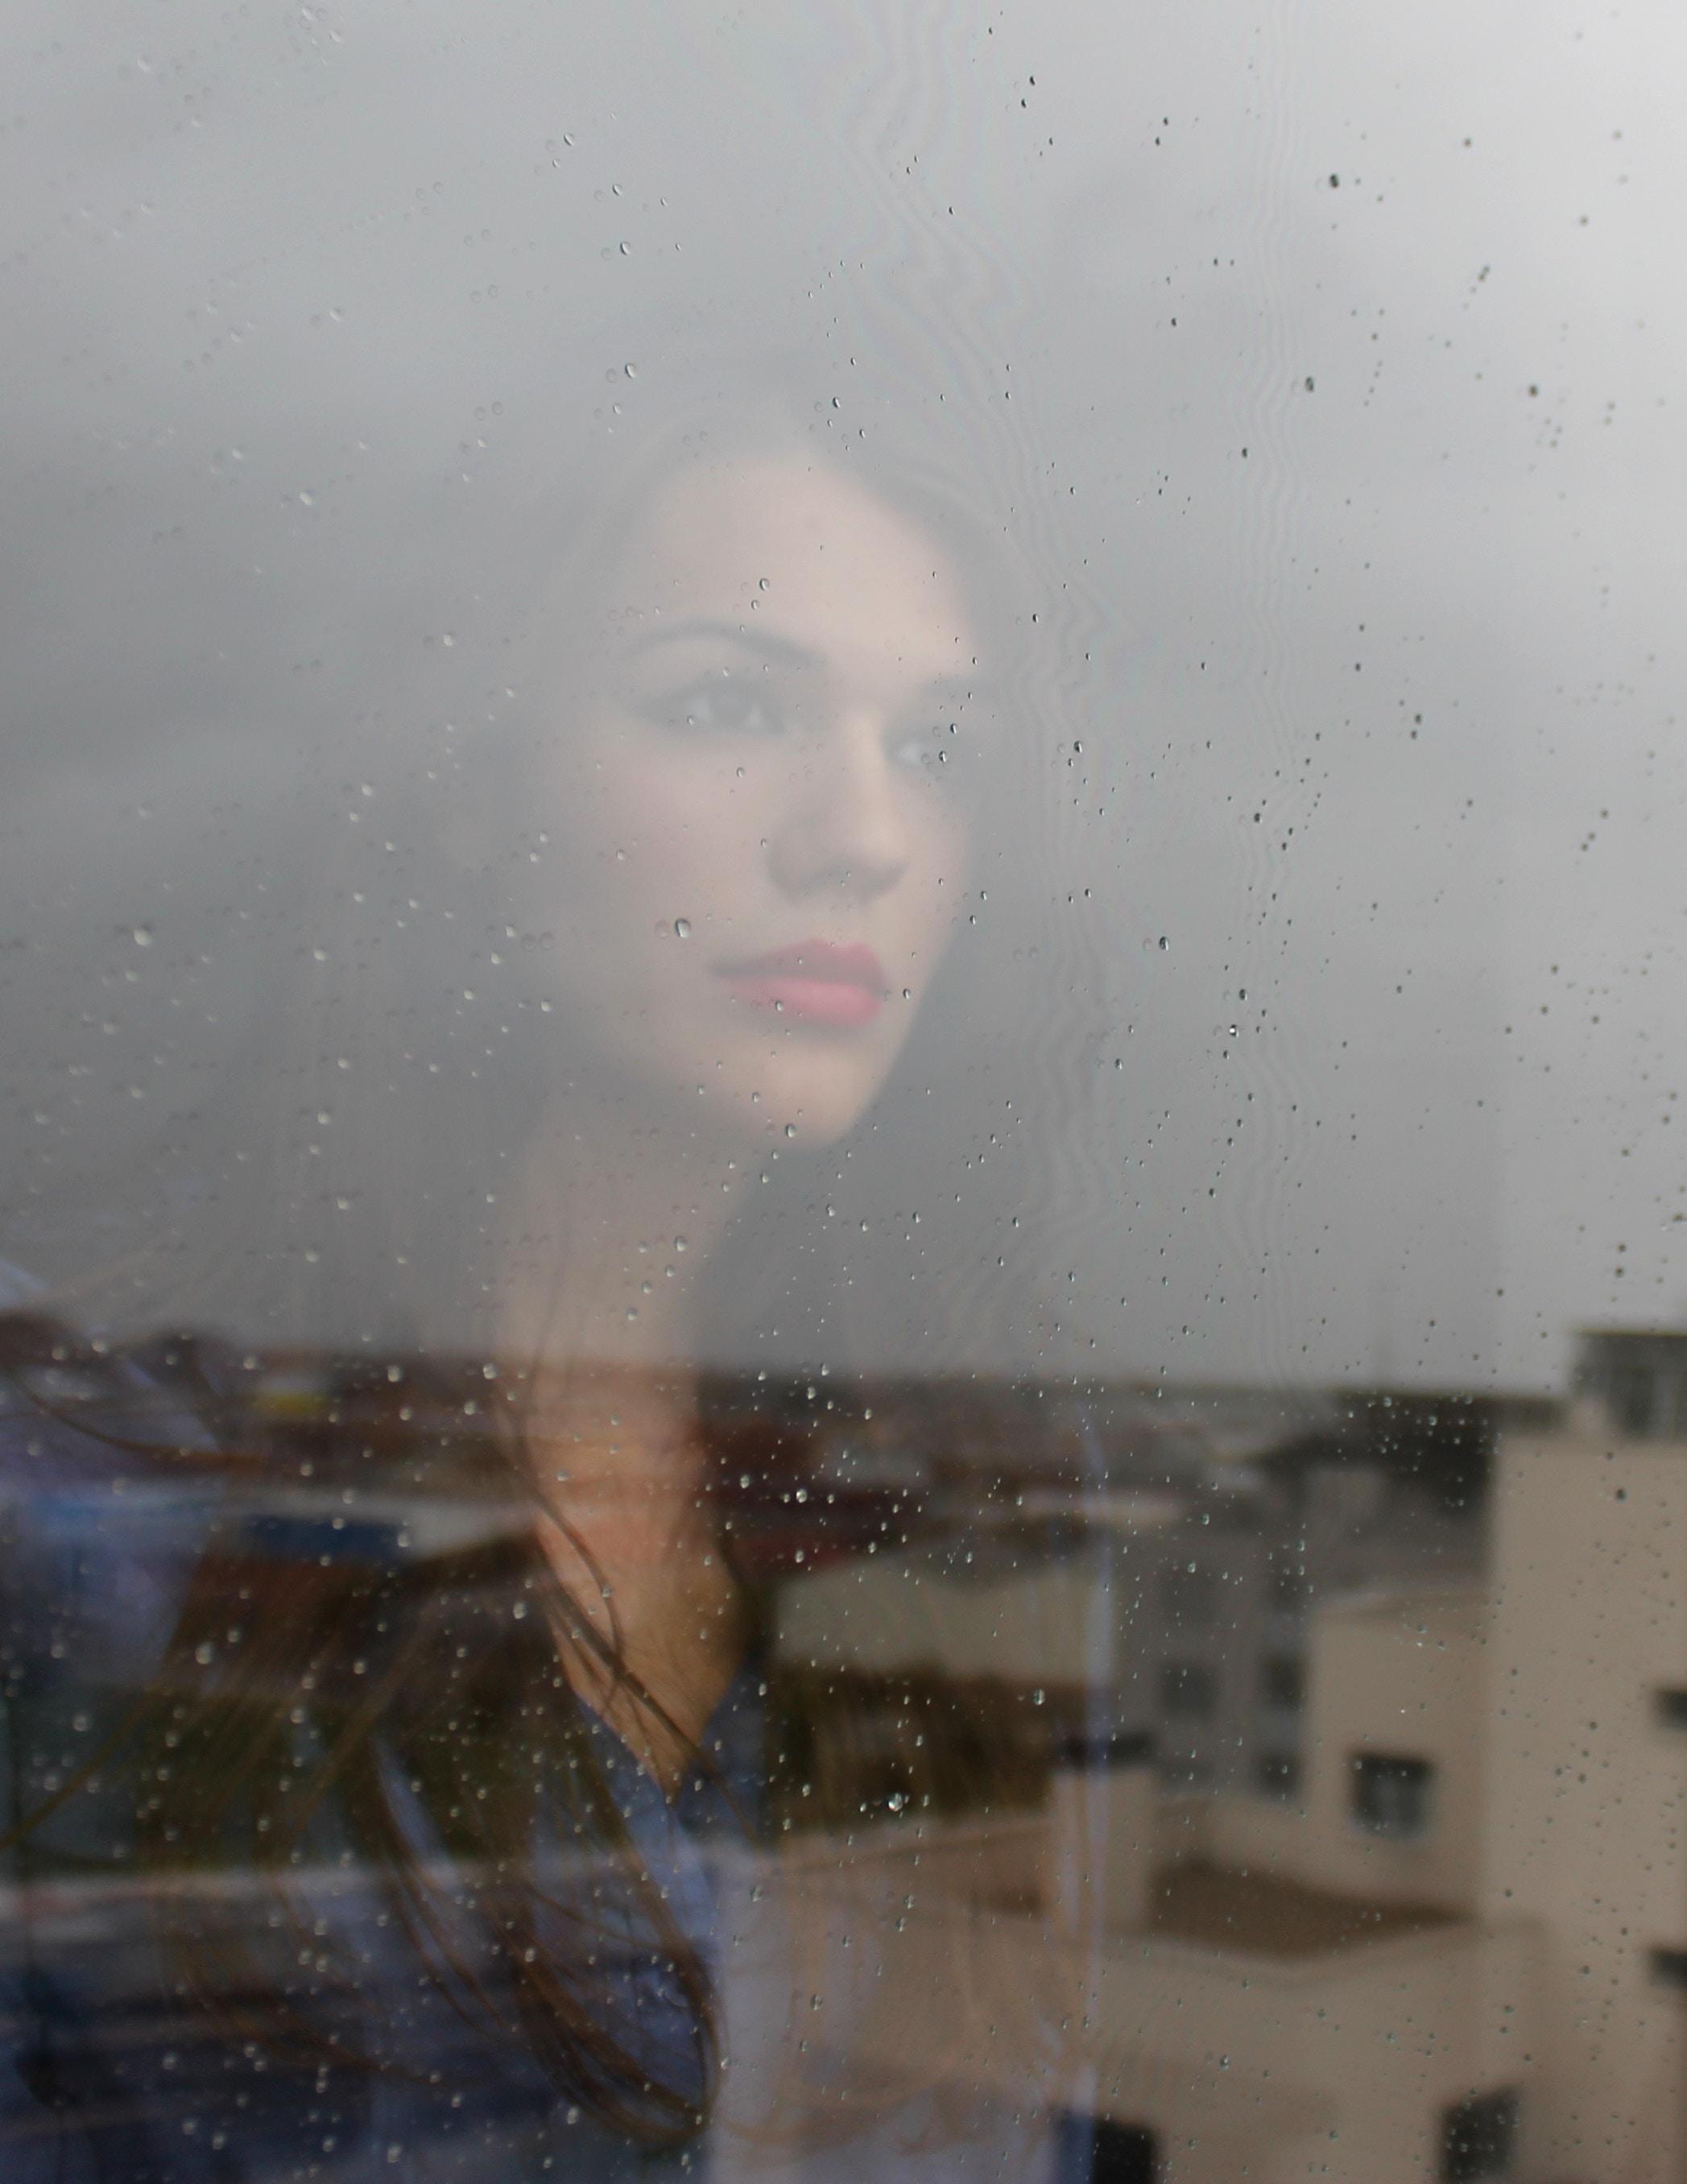 Photo by María Victoria Heredia Reyes on Unsplash